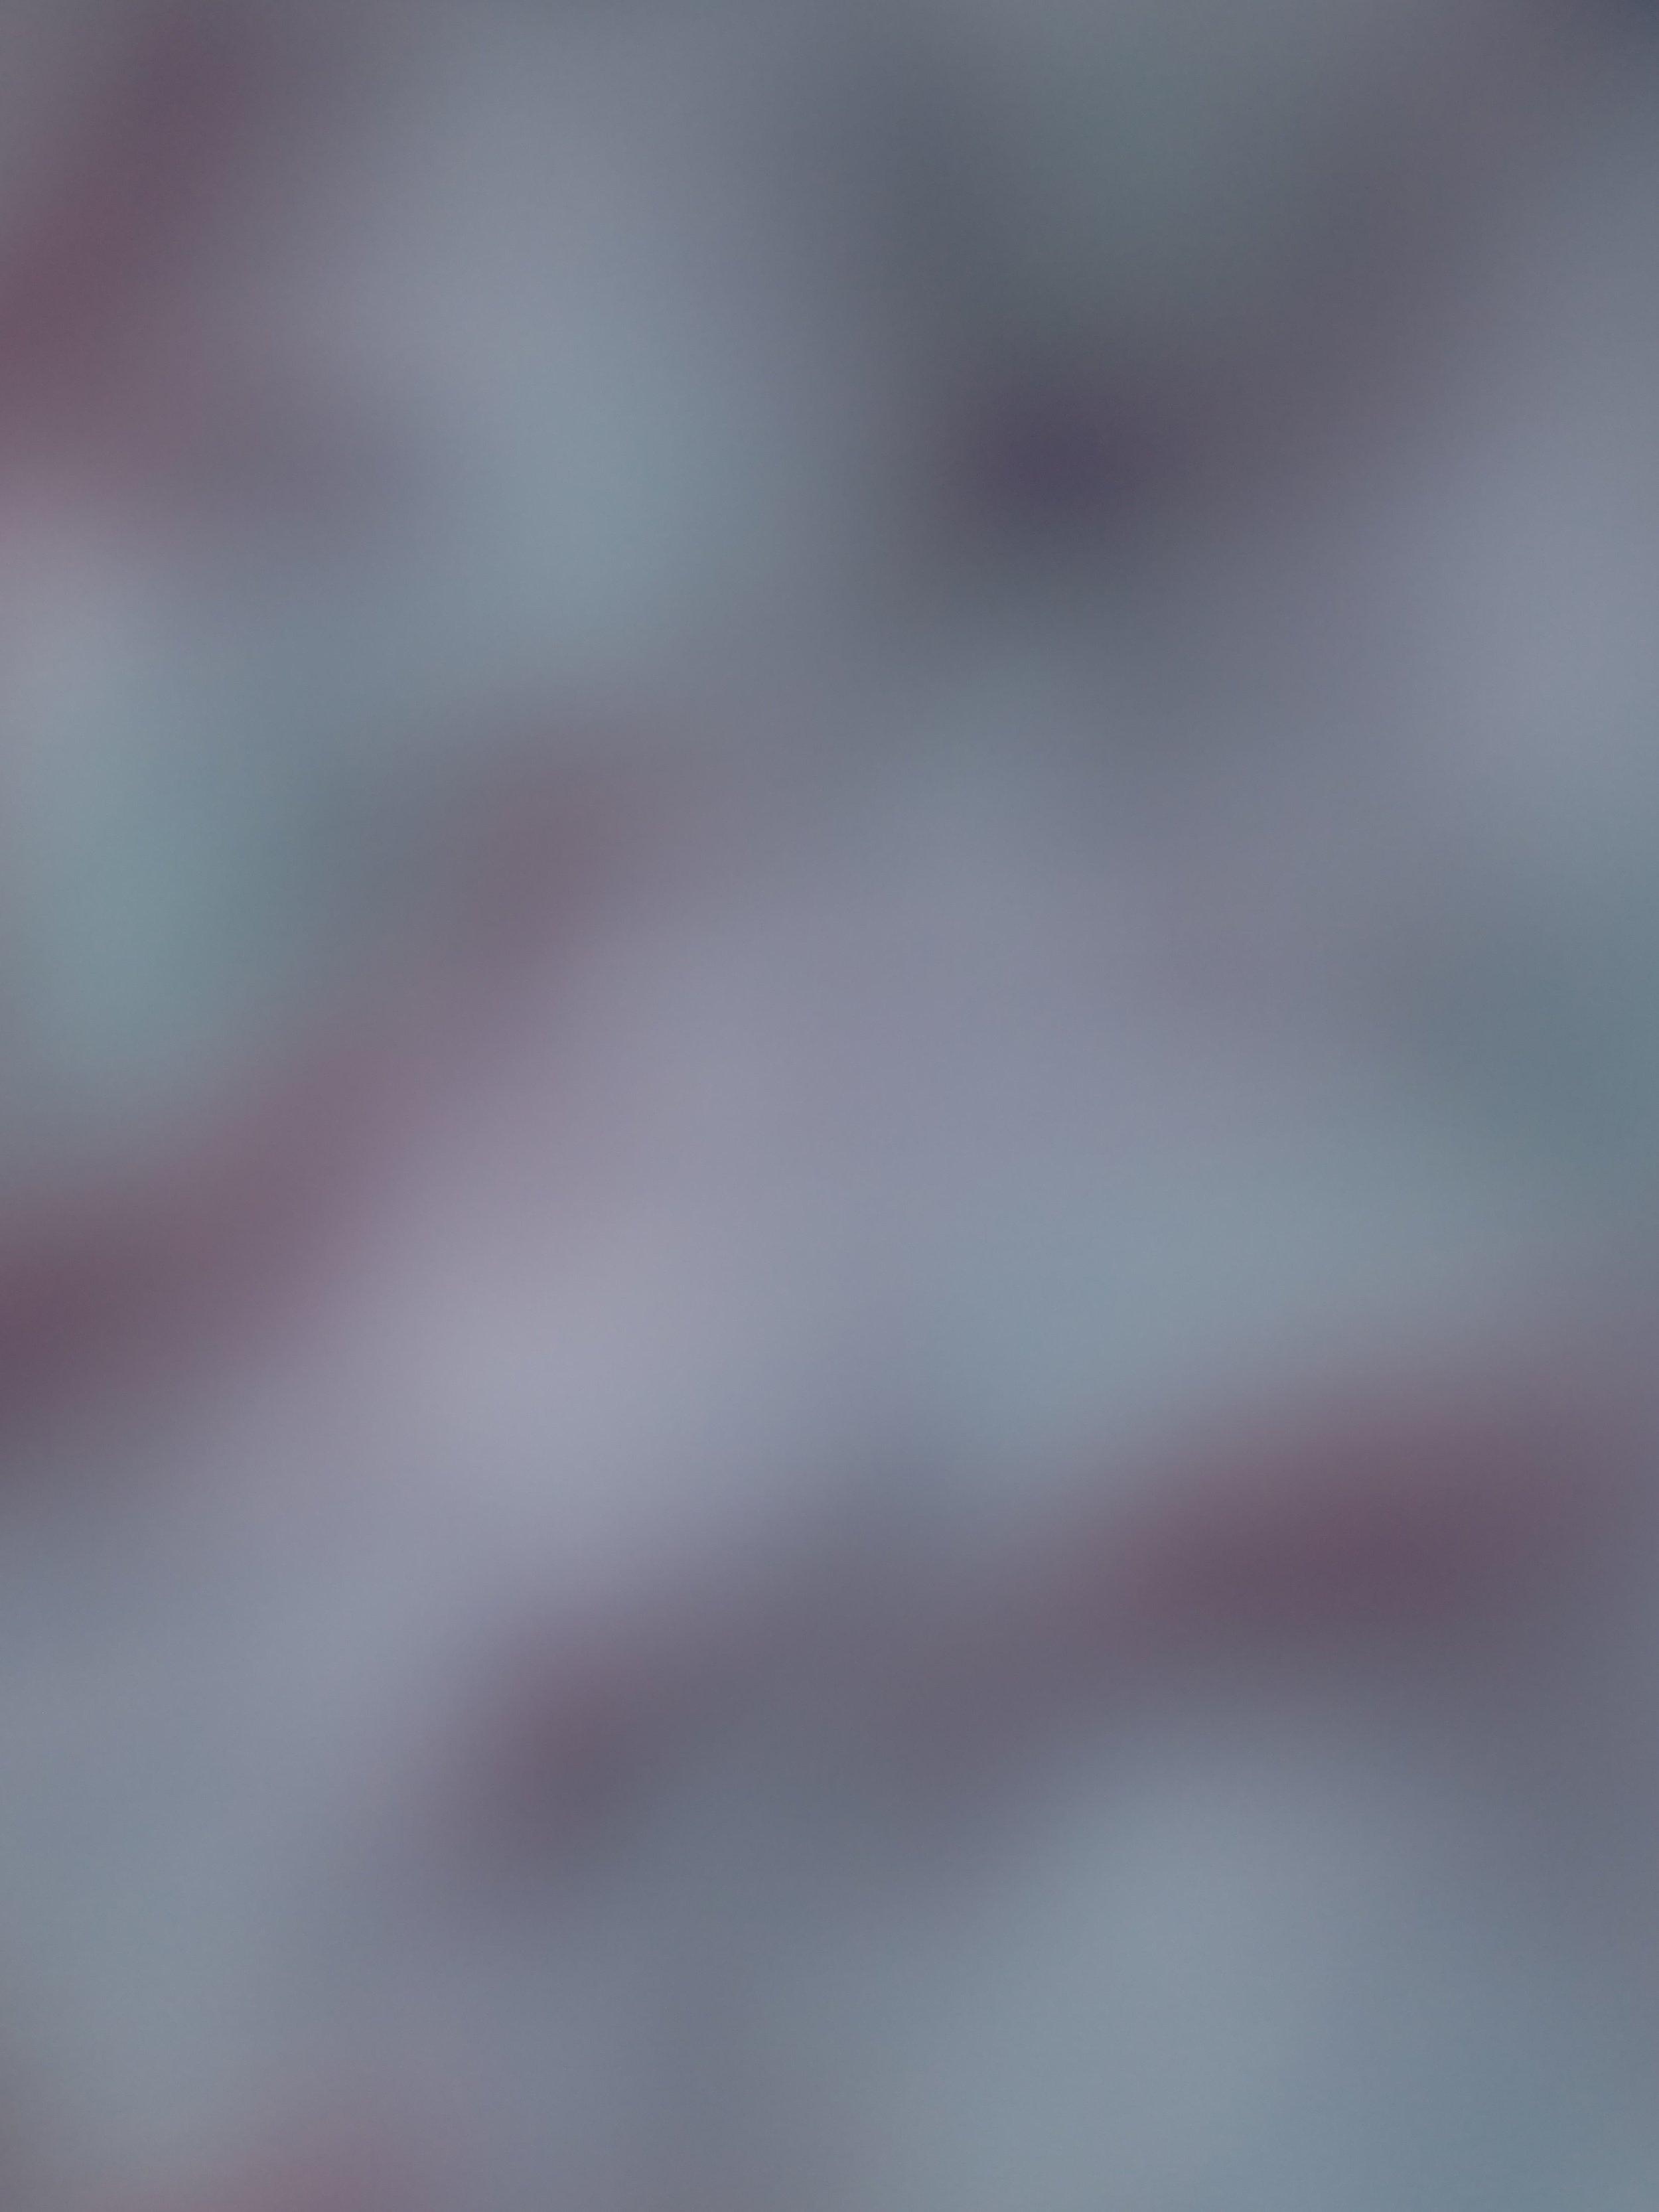 willroth-co-free-texture-gradient-003.jpg